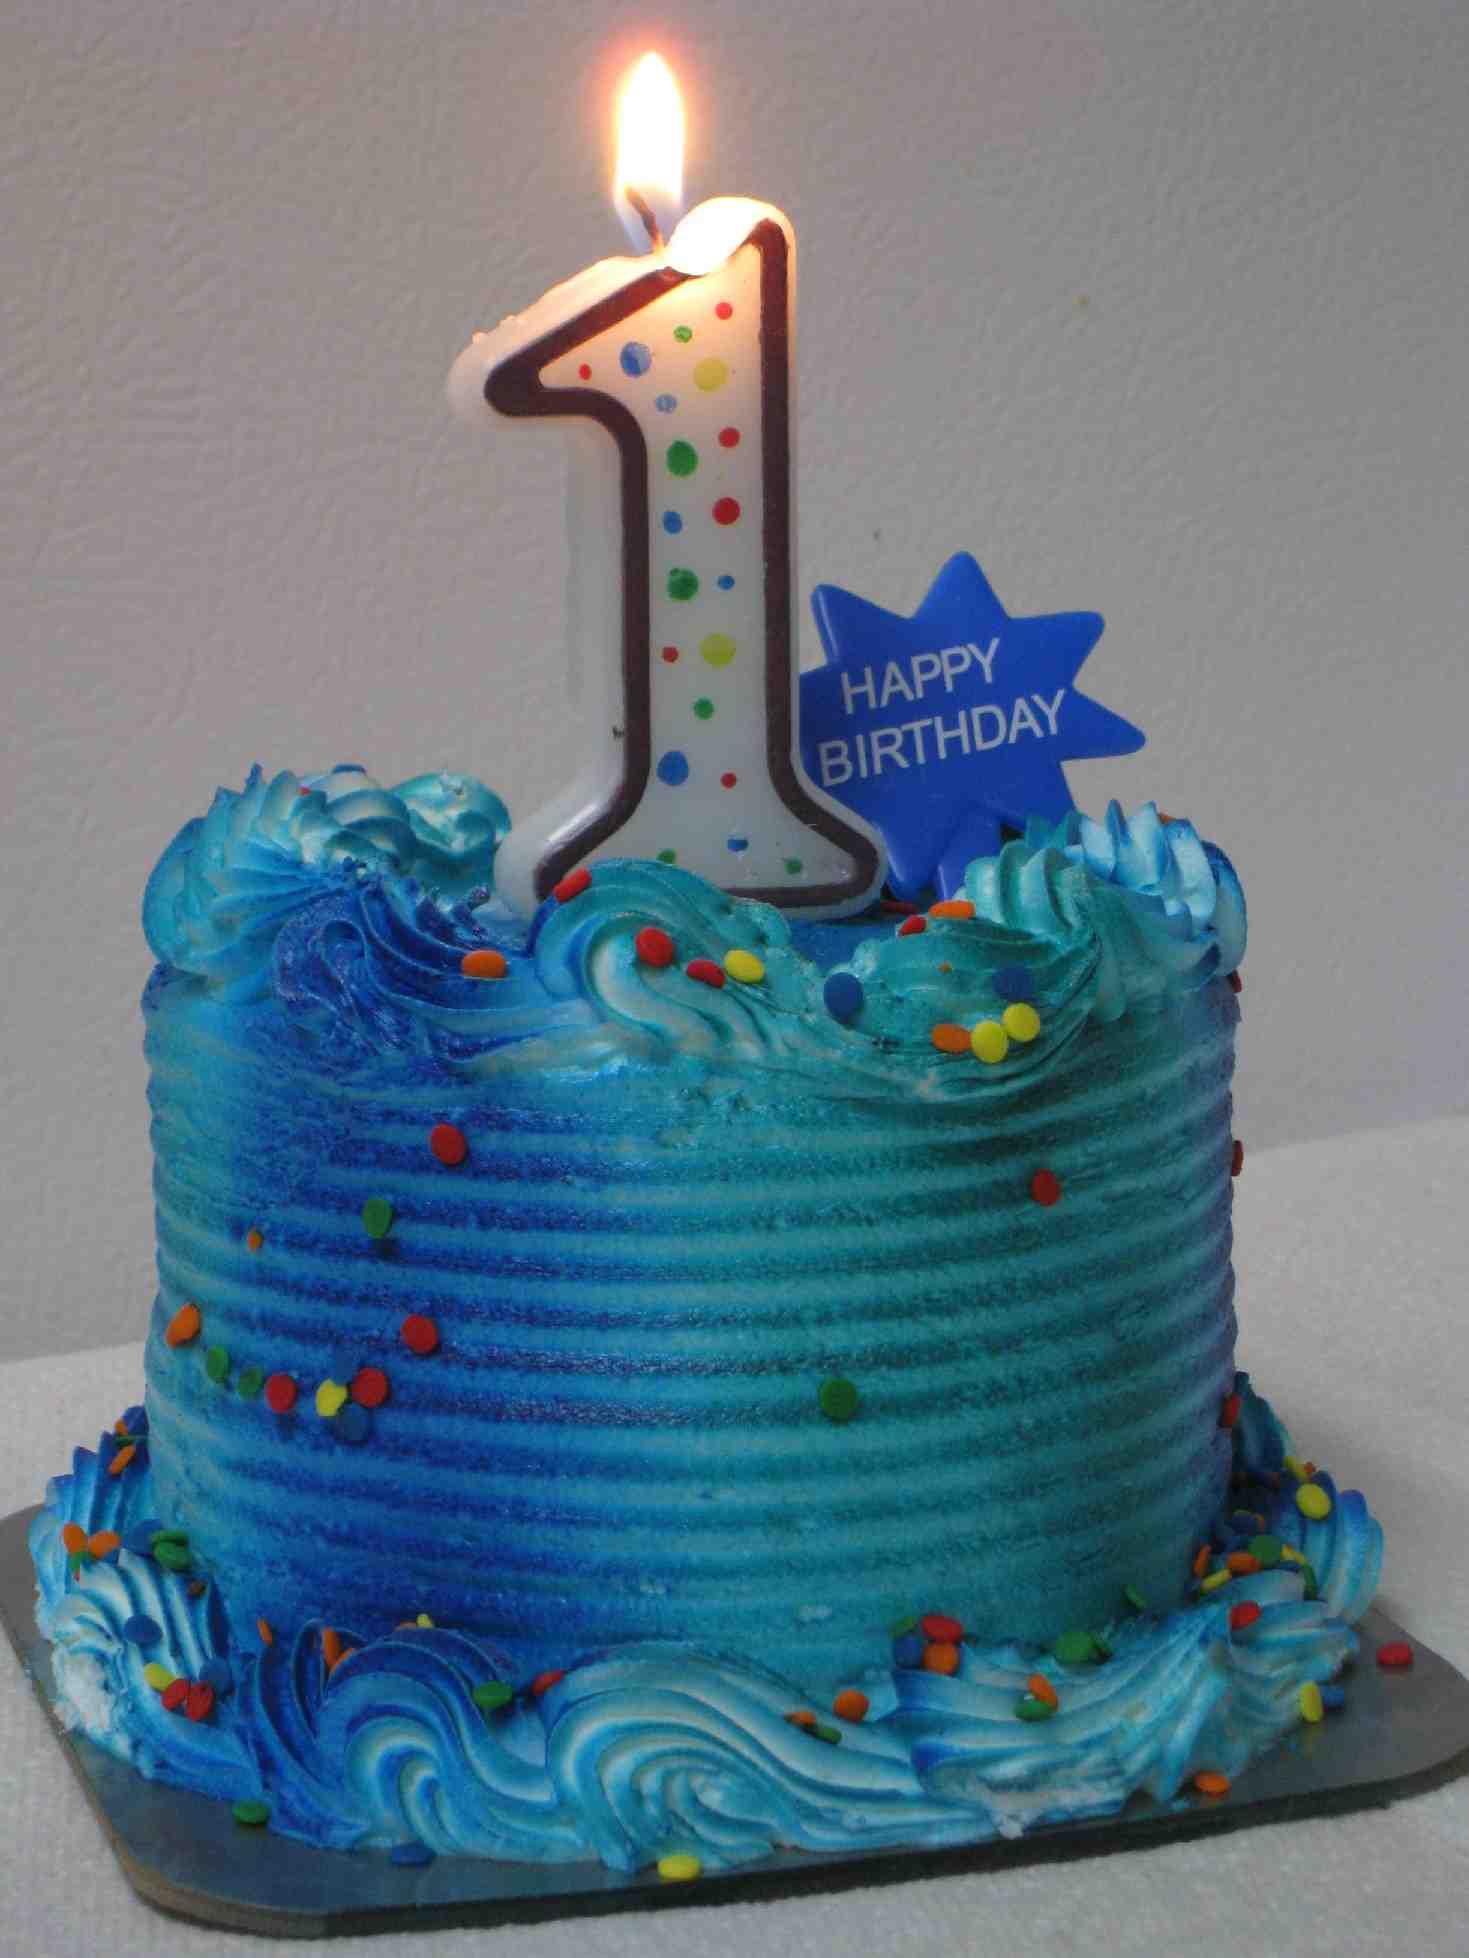 Happy 1st Birthday Envirohistory NZ Envirohistory NZ